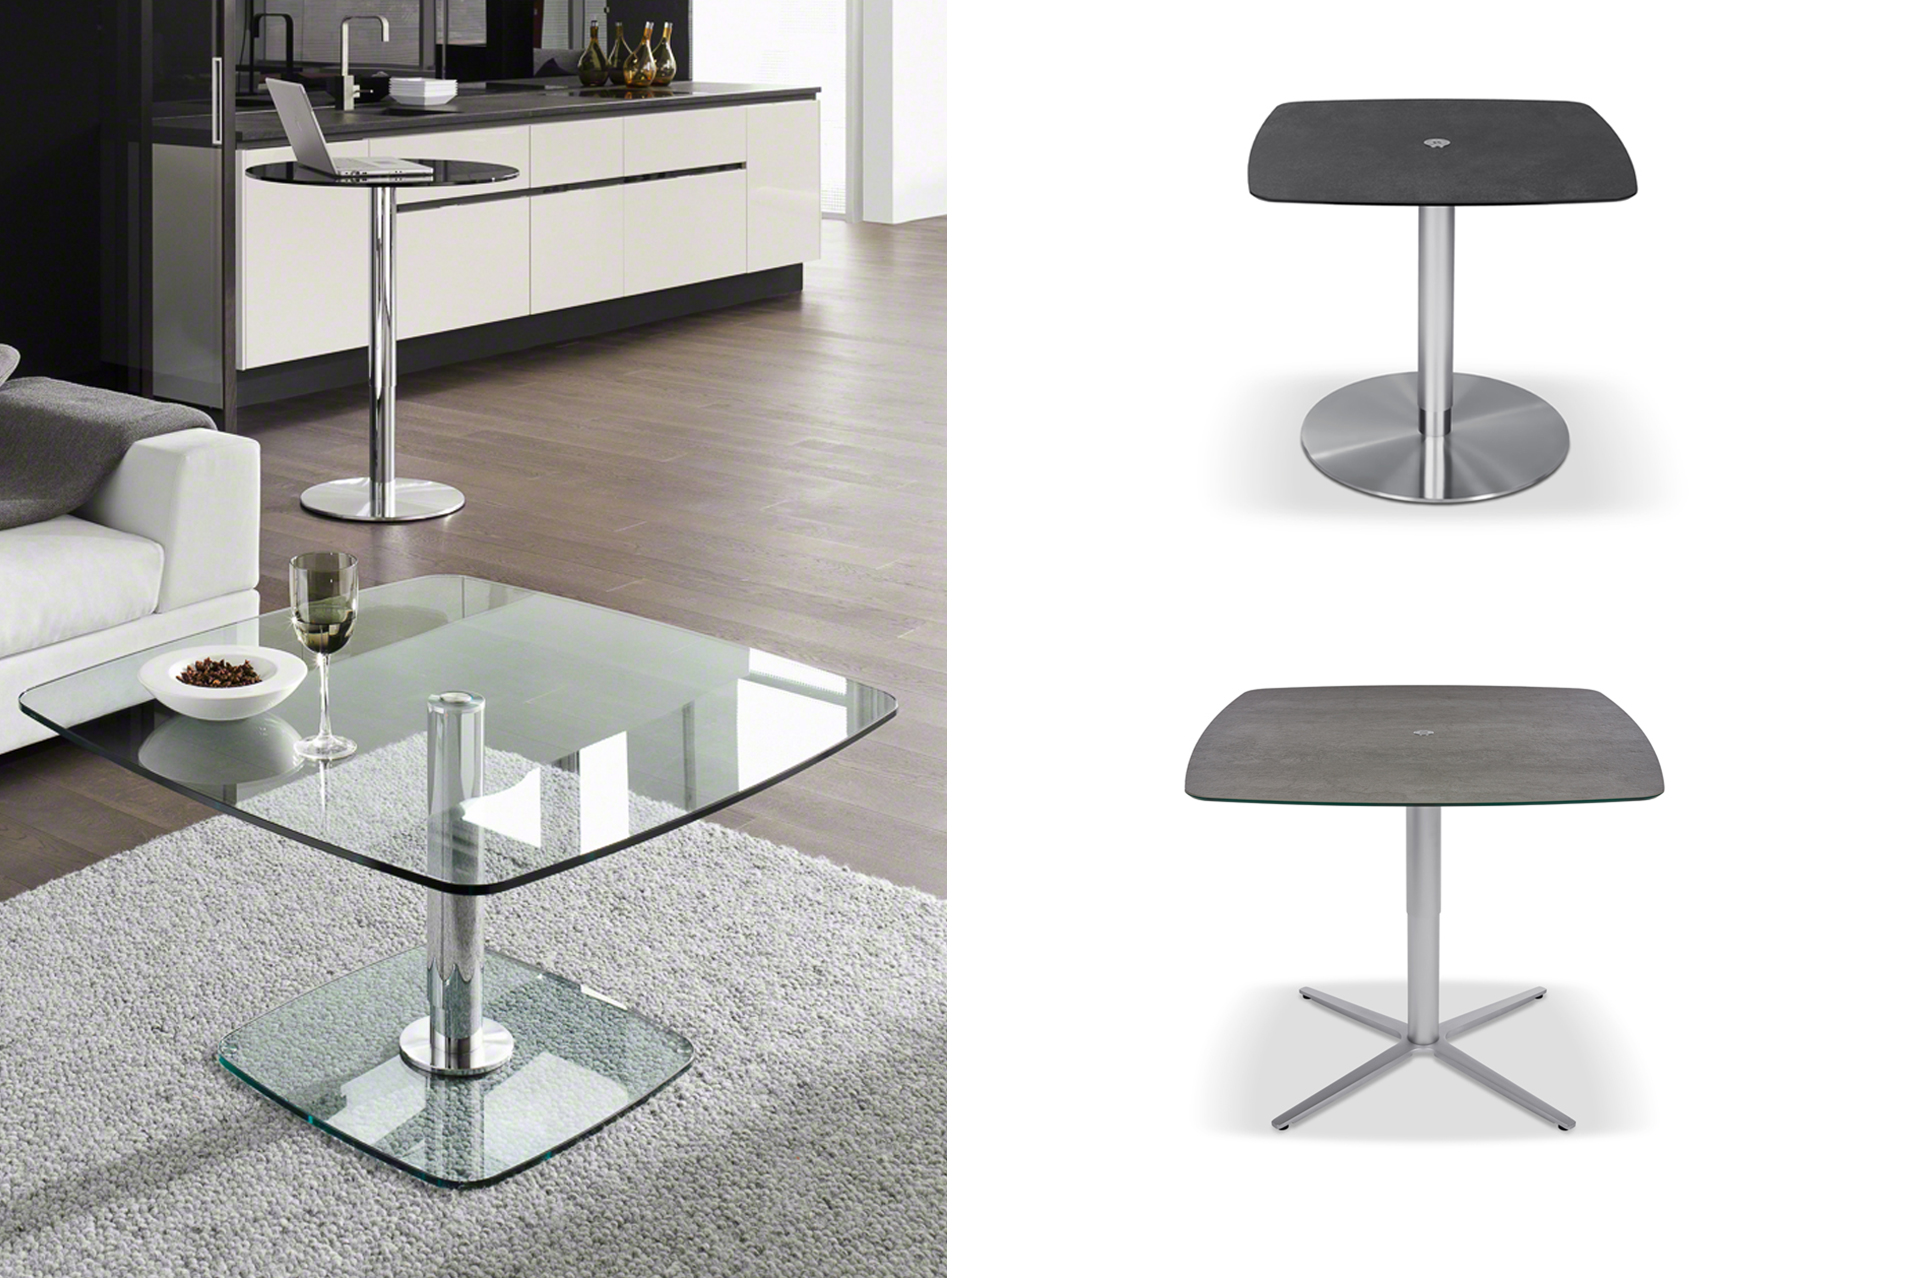 tisch p431e h he 65 bis 110 cm wohnopposition berlin. Black Bedroom Furniture Sets. Home Design Ideas